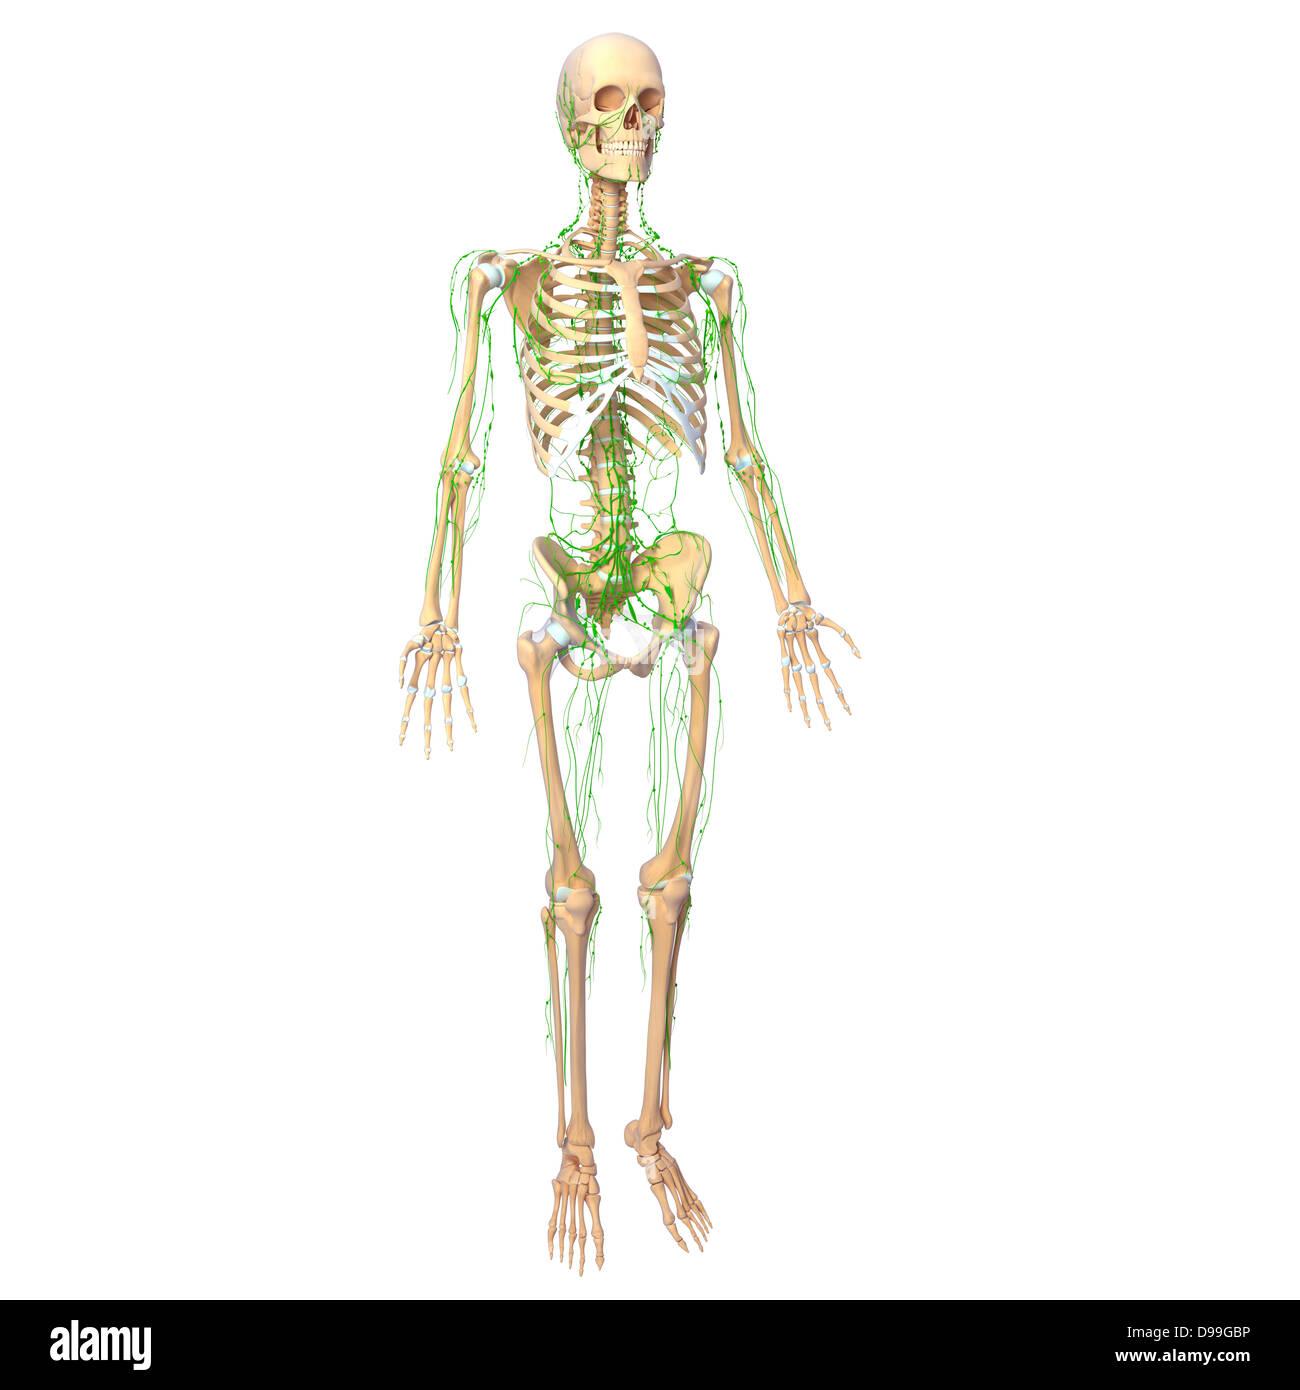 Lymph System Imágenes De Stock & Lymph System Fotos De Stock - Alamy